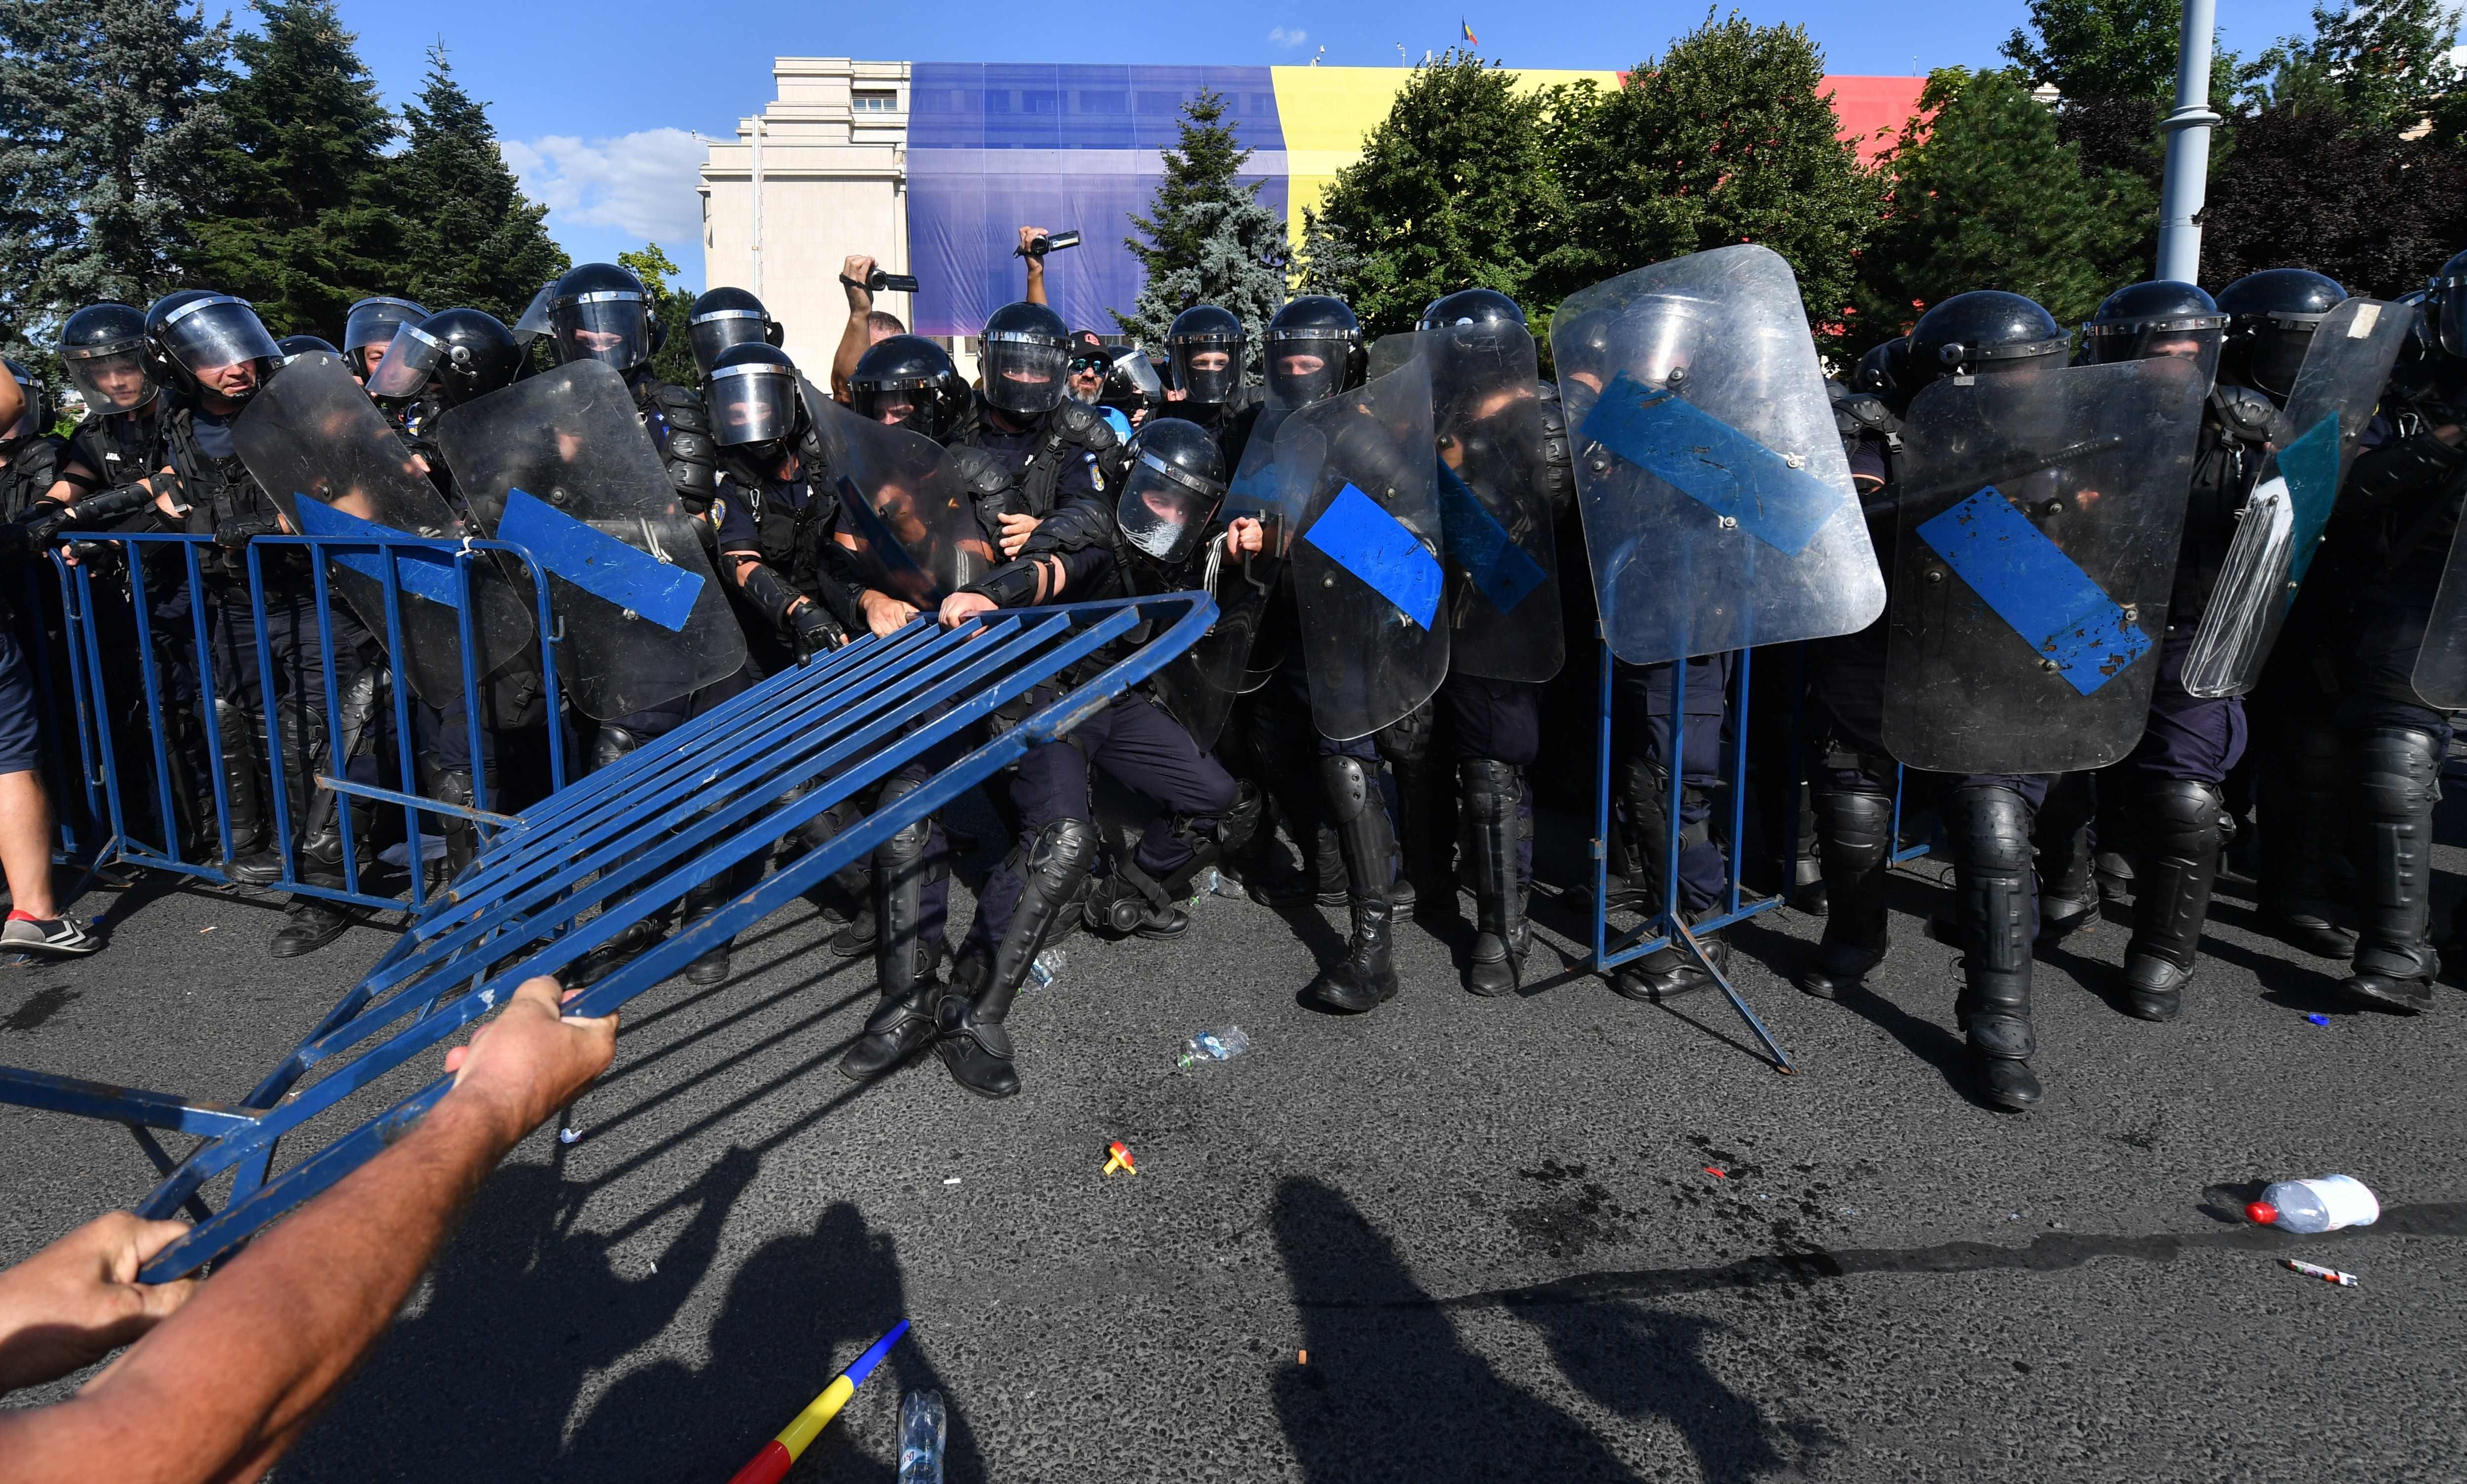 مظاهرات رومانيا